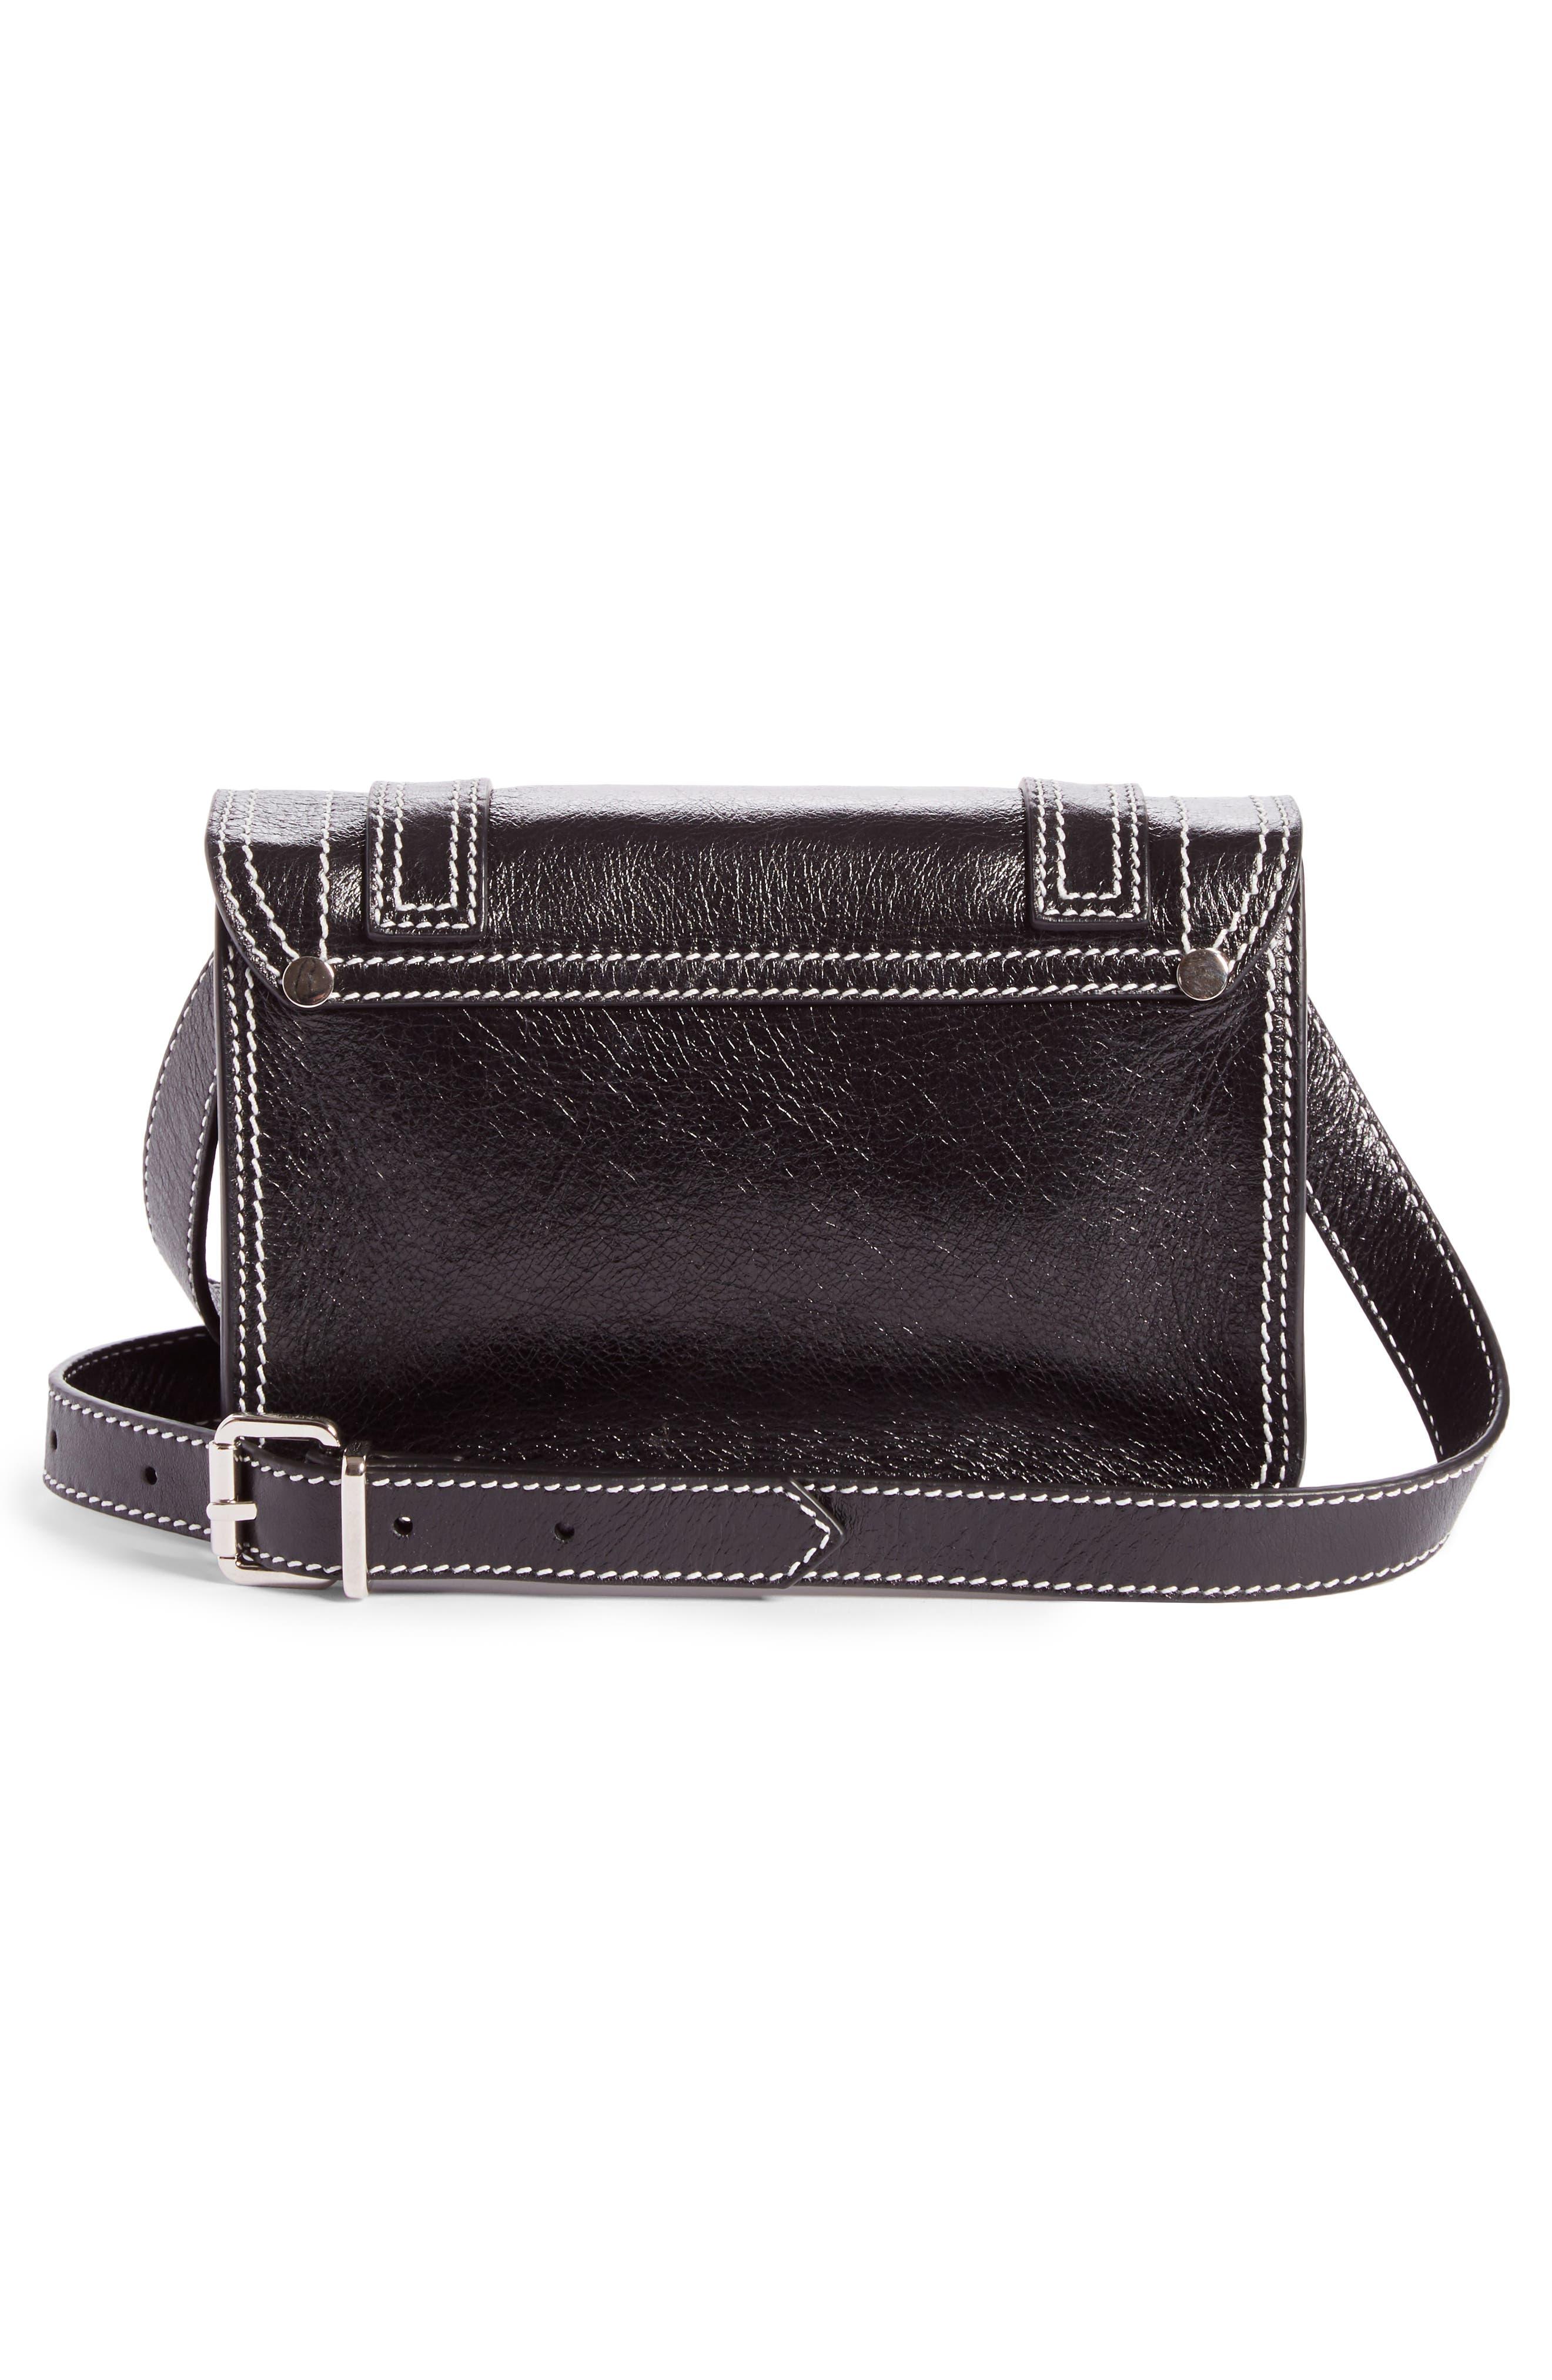 Alternate Image 3  - Proenza Schouler Mini PS1 Leather Crossbody Bag